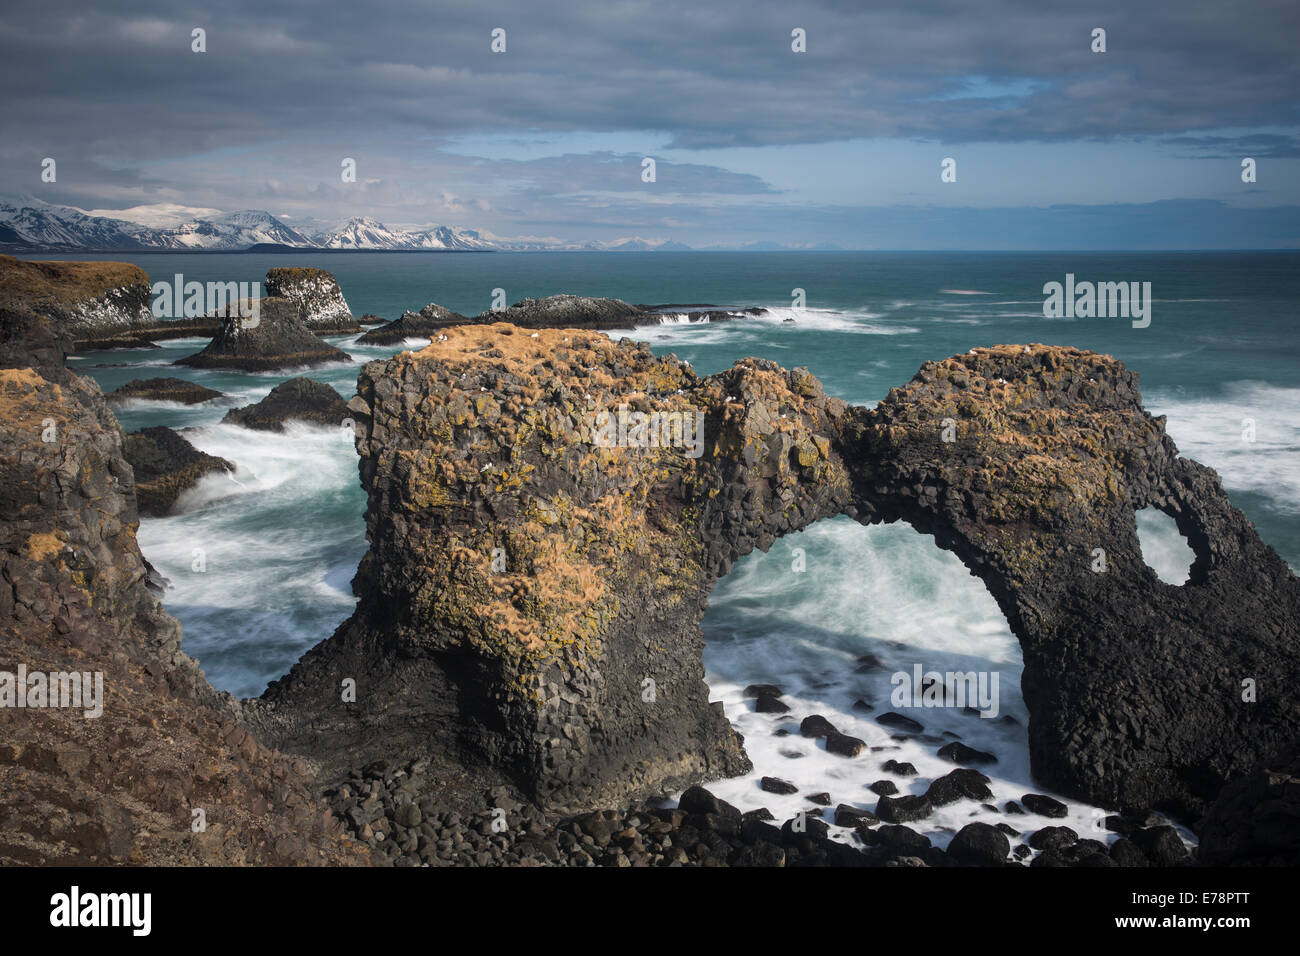 the rock arch of Gatklettur on the coast nr Arnastapi, Snaefellsnes Peninsula, western Iceland - Stock Image